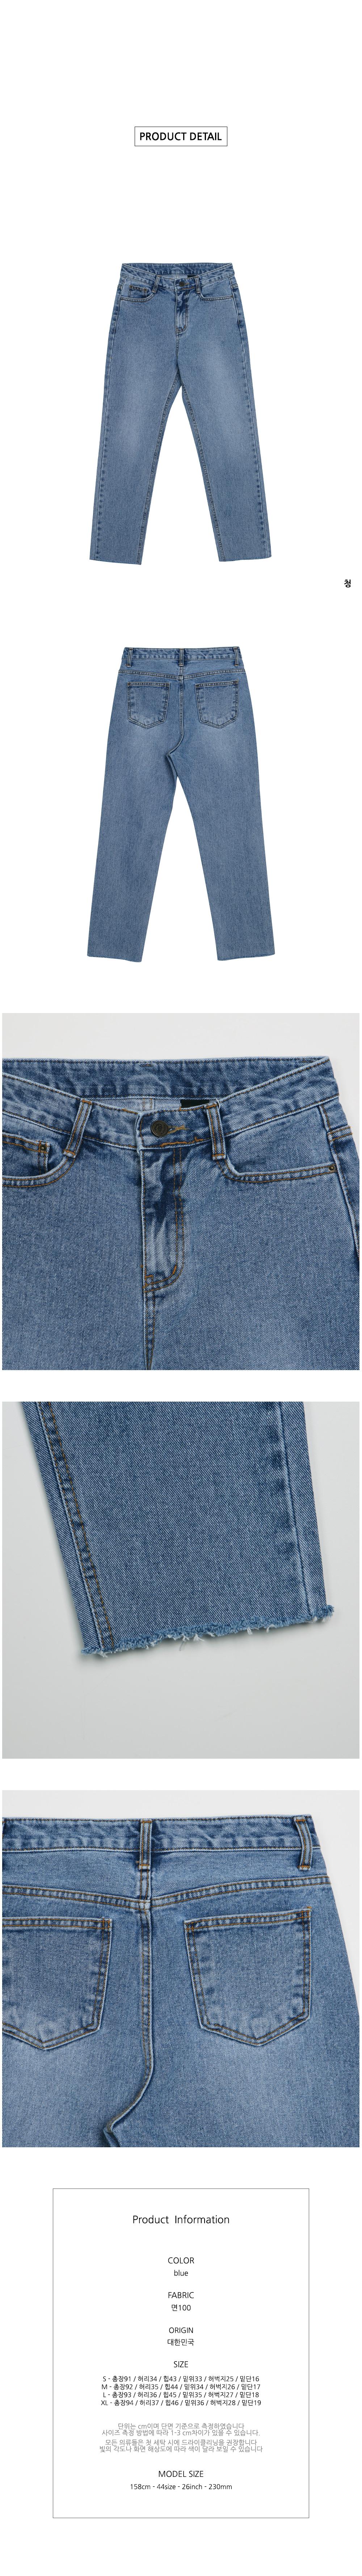 Semi-wide denim pants P#YW413